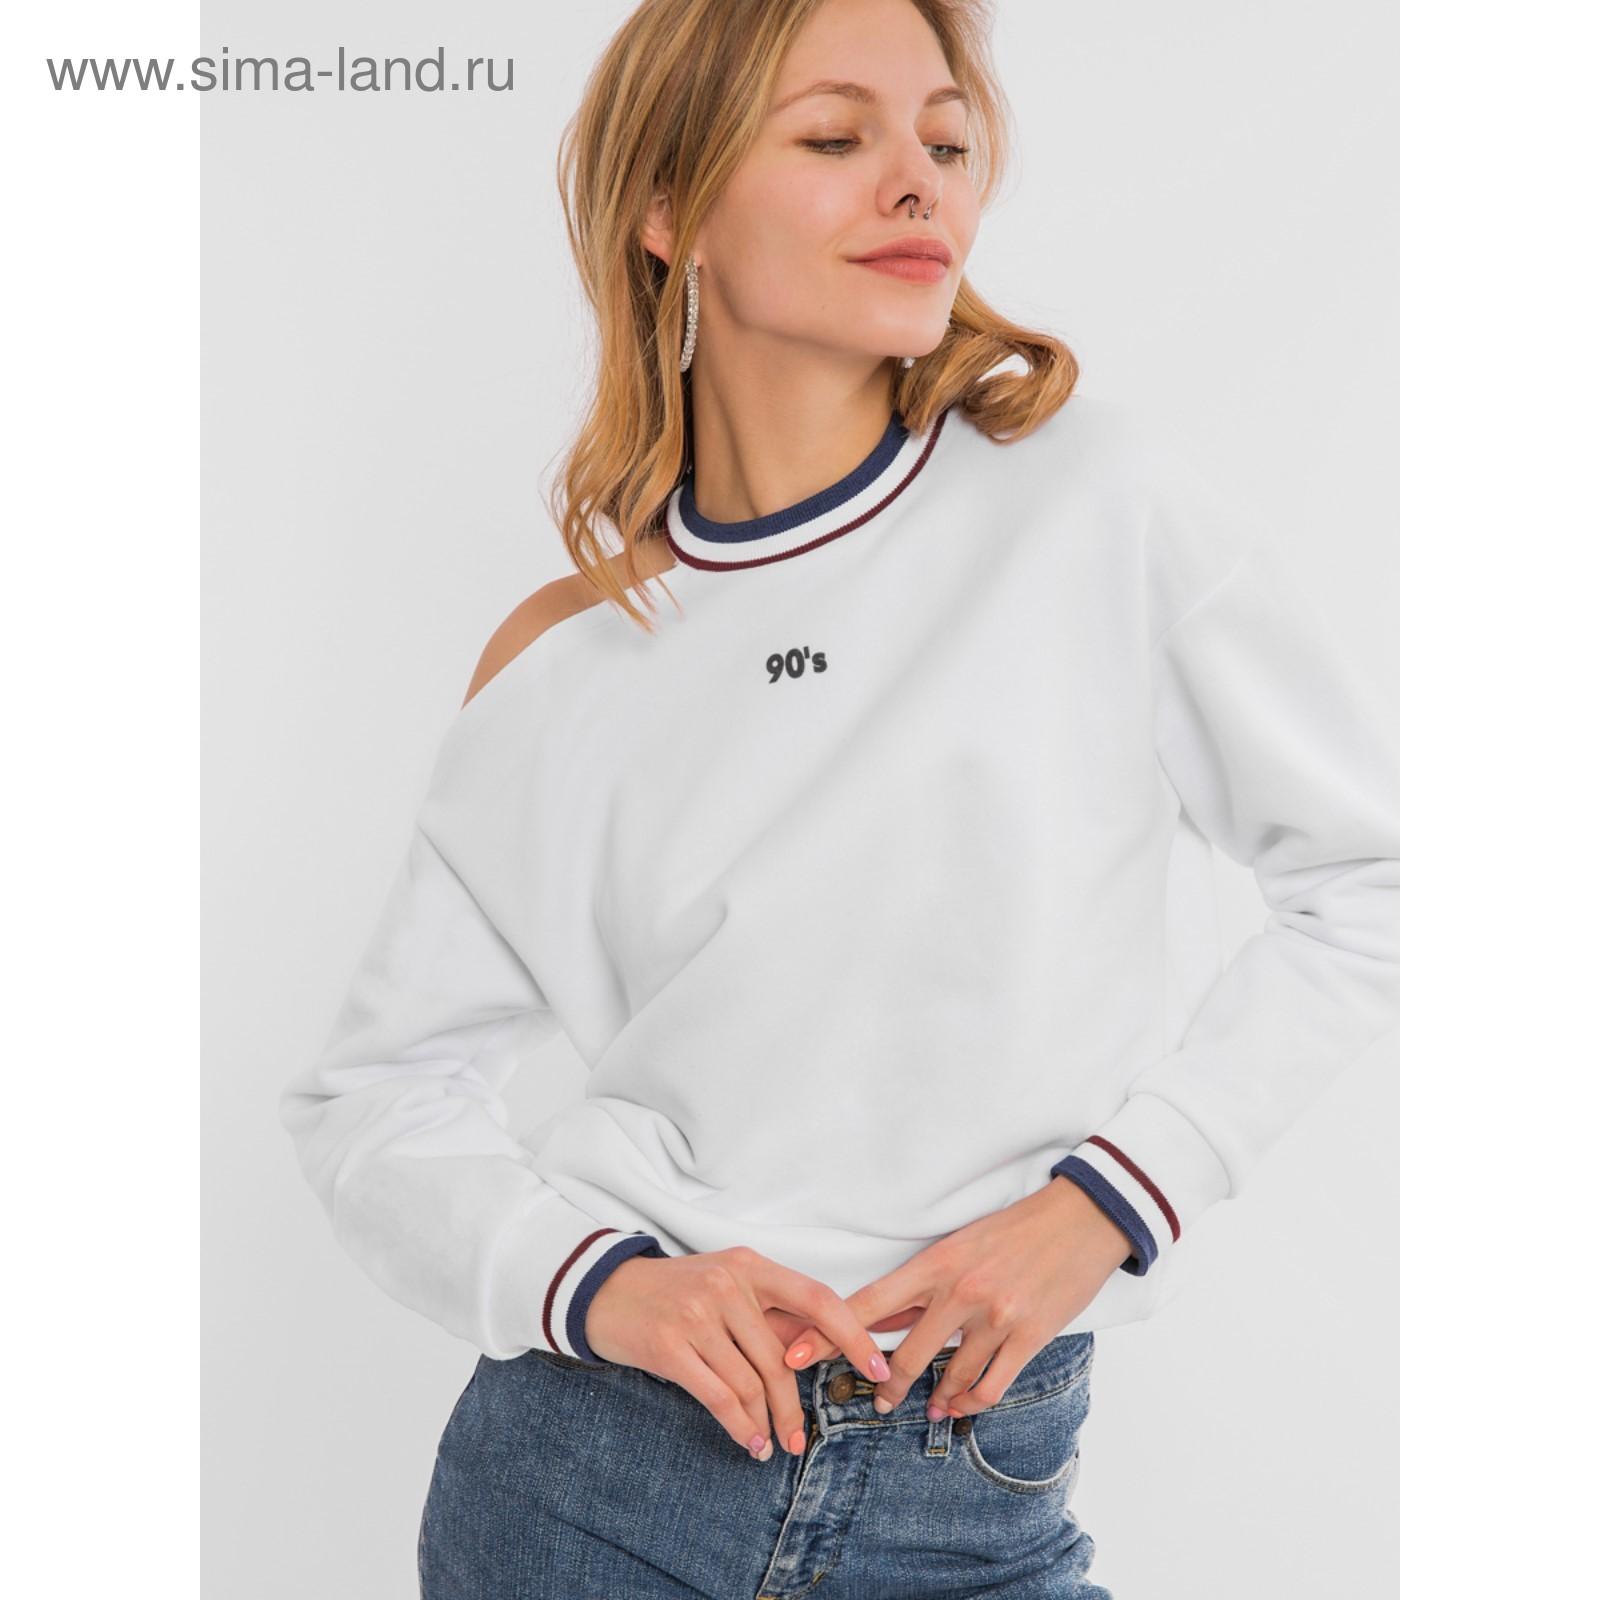 fa8fe79237e1c Свитшот женский, цвет белый, размер 50 (XL) (122490(19-4981-7П ...